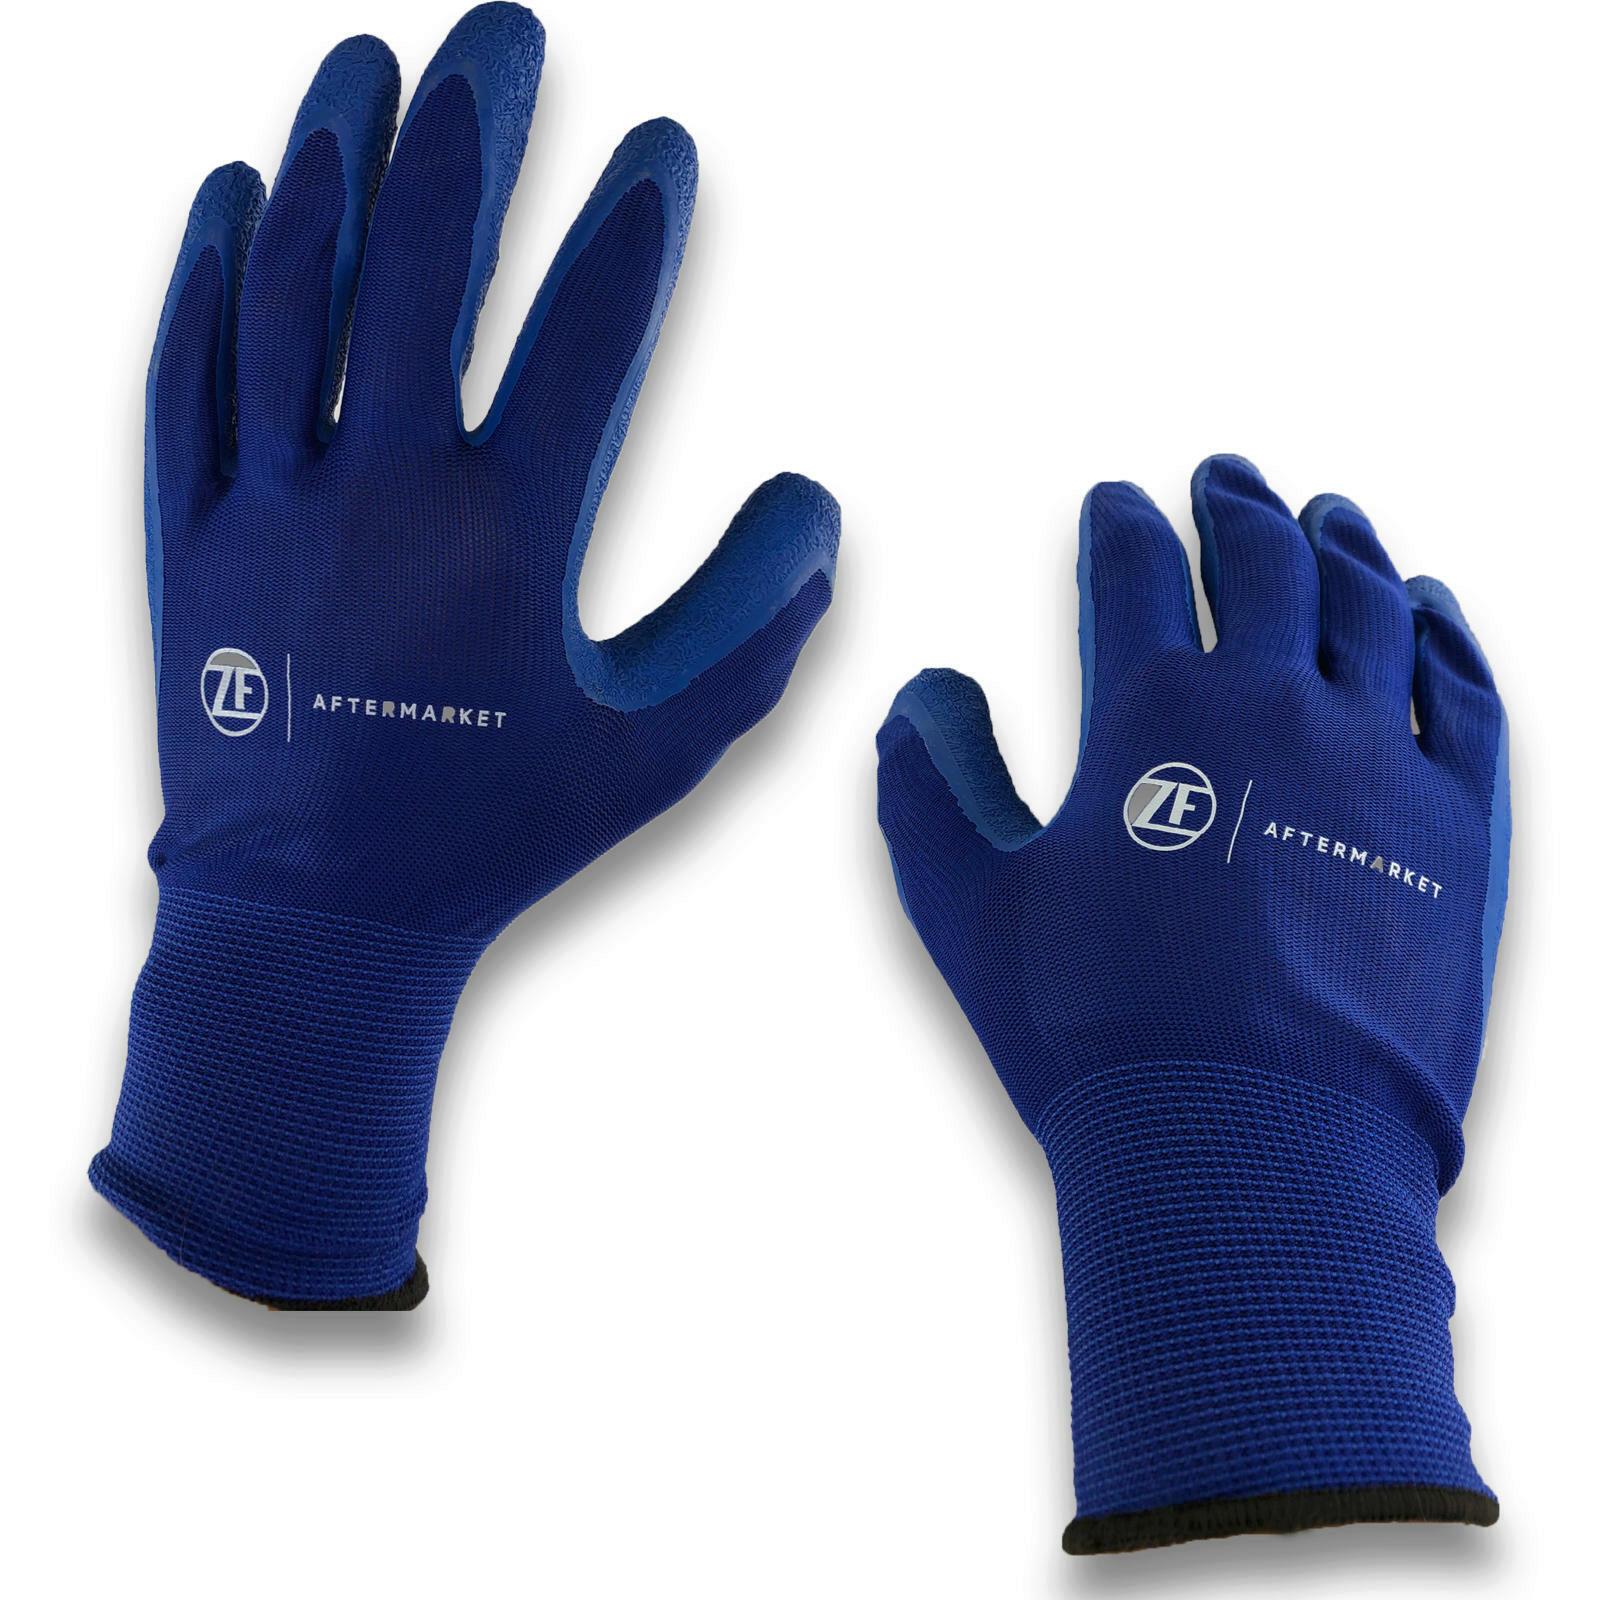 2 Mechaniker Handschuhe Größe 10